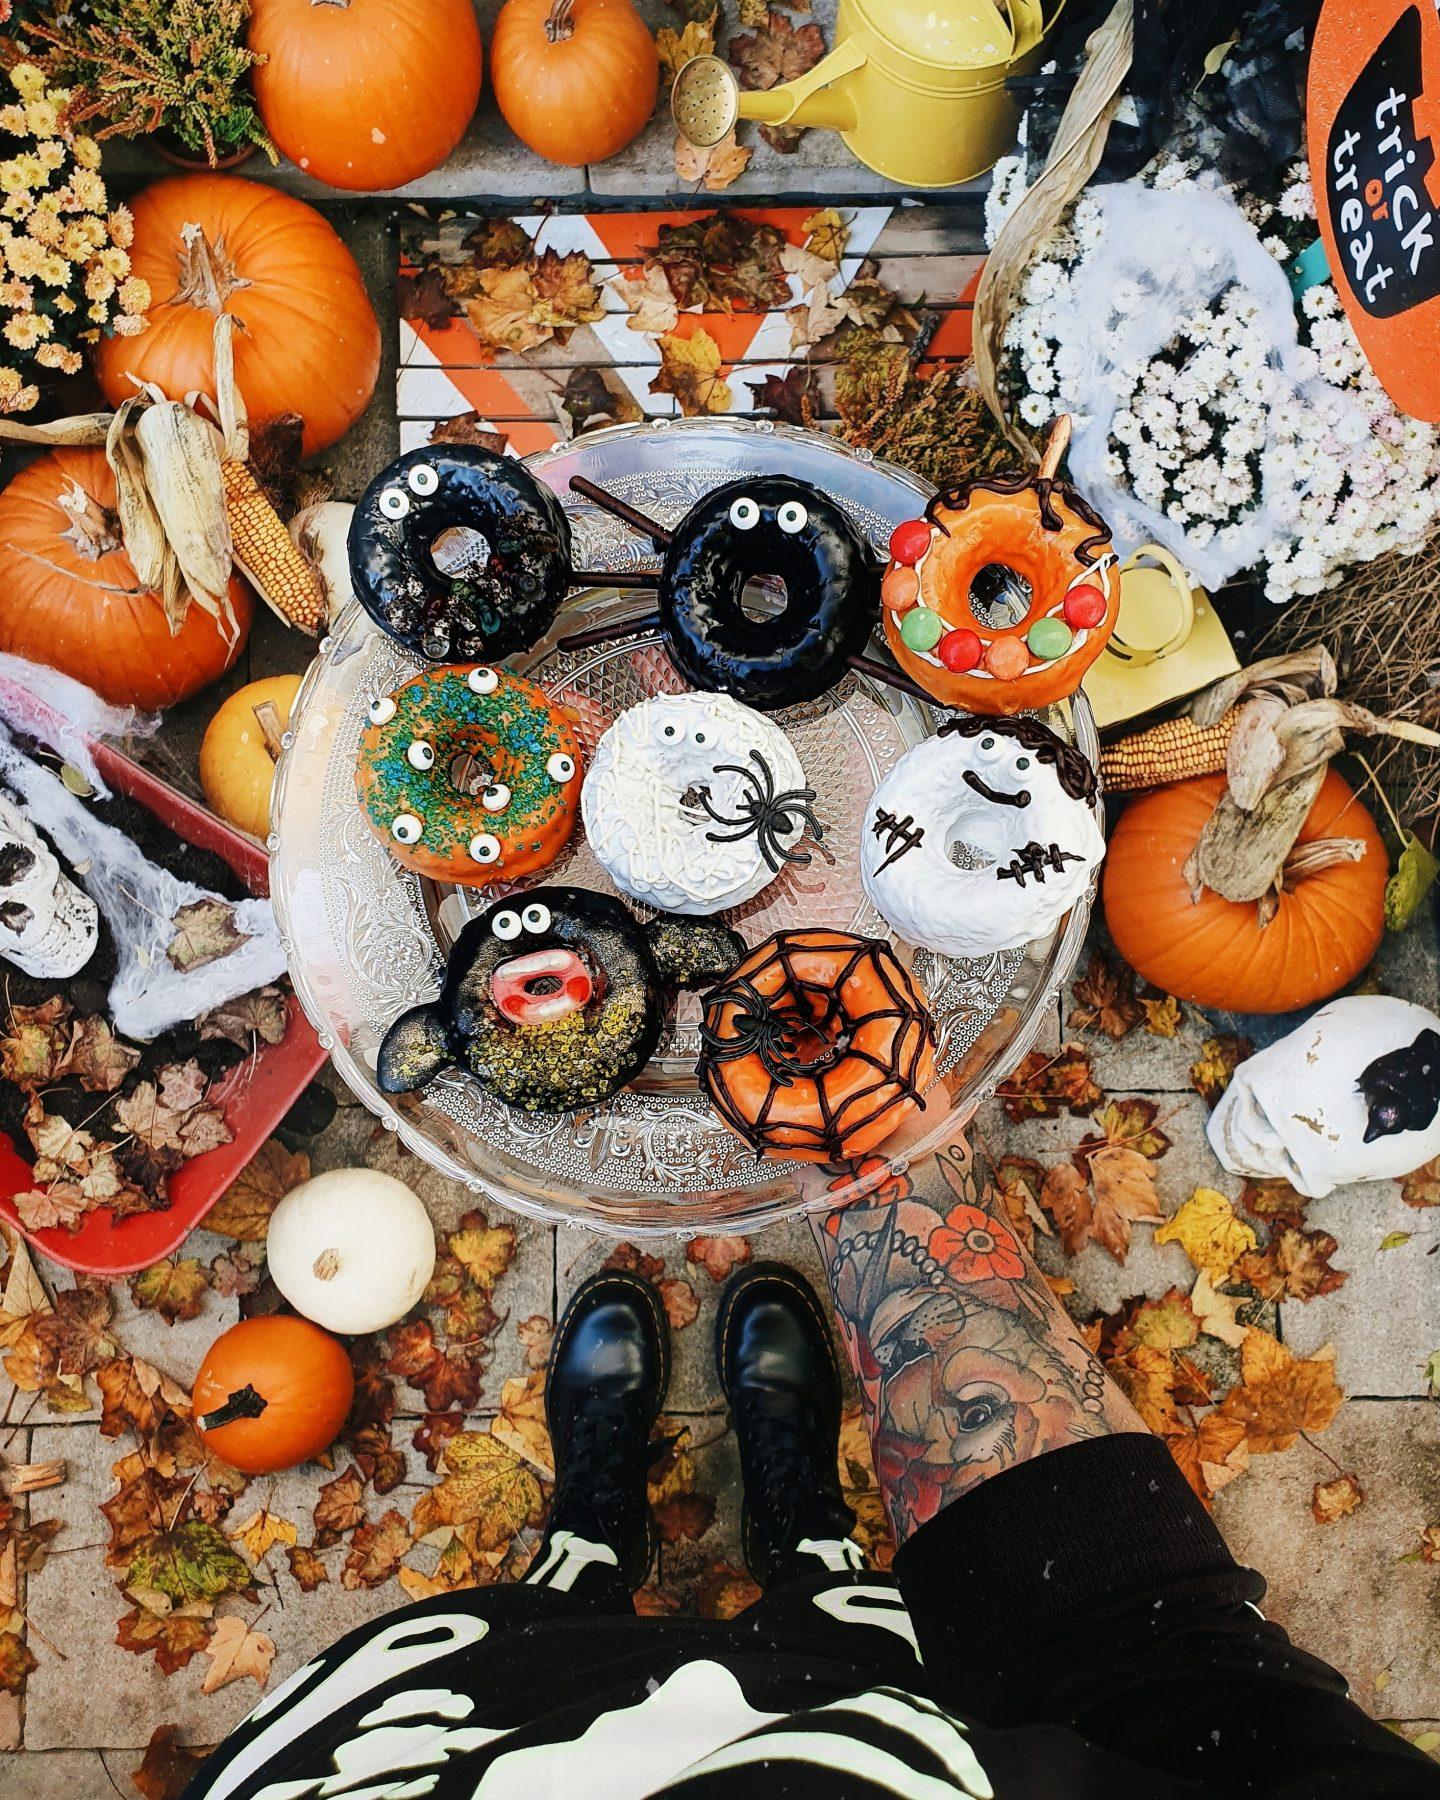 Inspiration Spooky Doobi Boo Last Minute Tipps Fur Deine Halloween Party Dekoration Kostume Food Starlights In The Kitchen